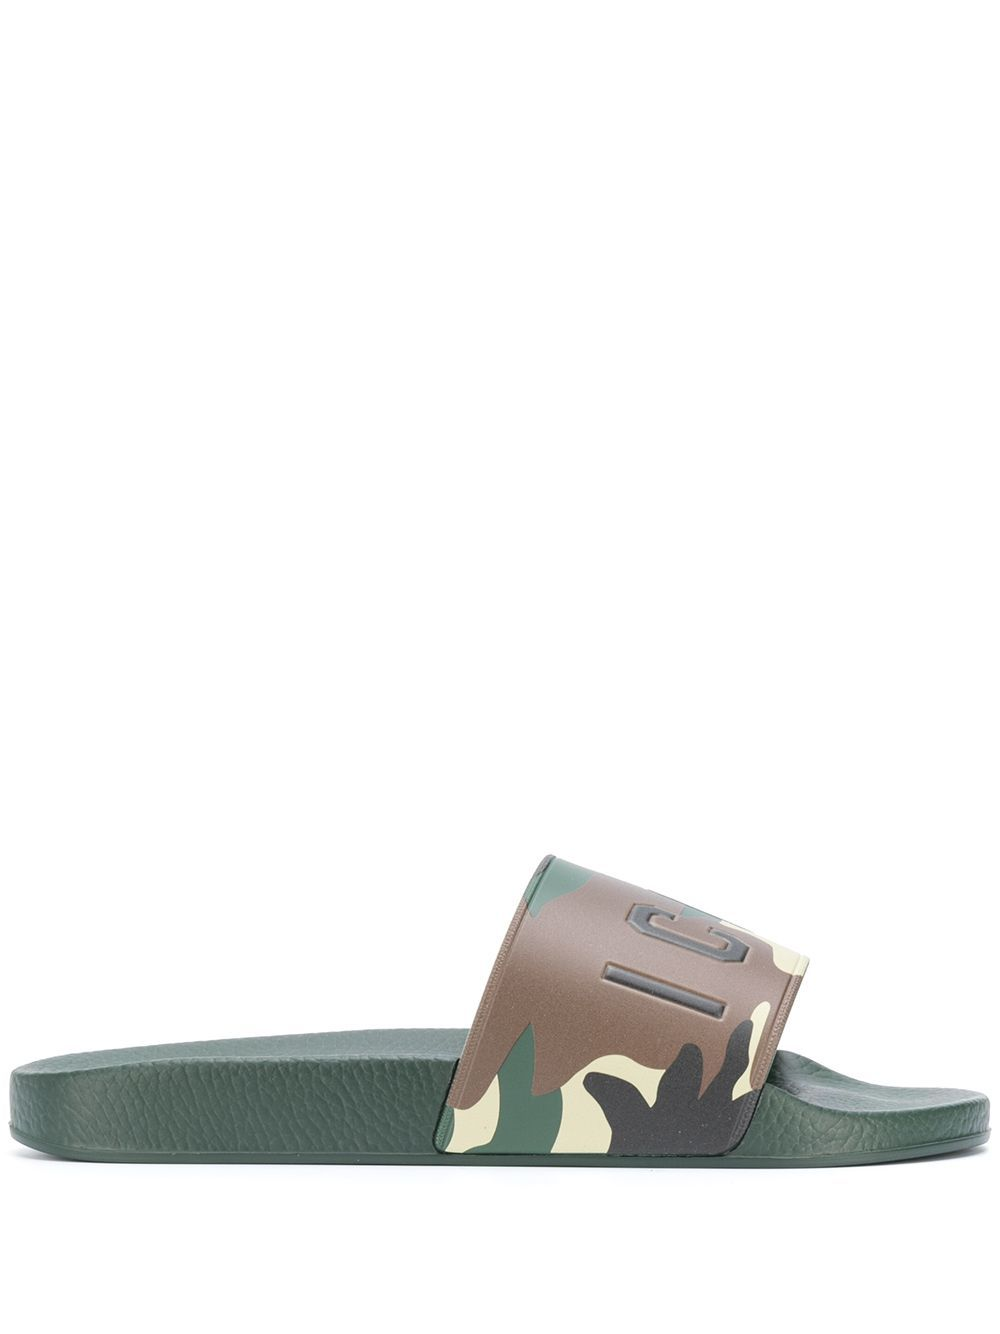 Dsquared2 Sandals DSQUARED2 MEN'S GREEN RUBBER SANDALS